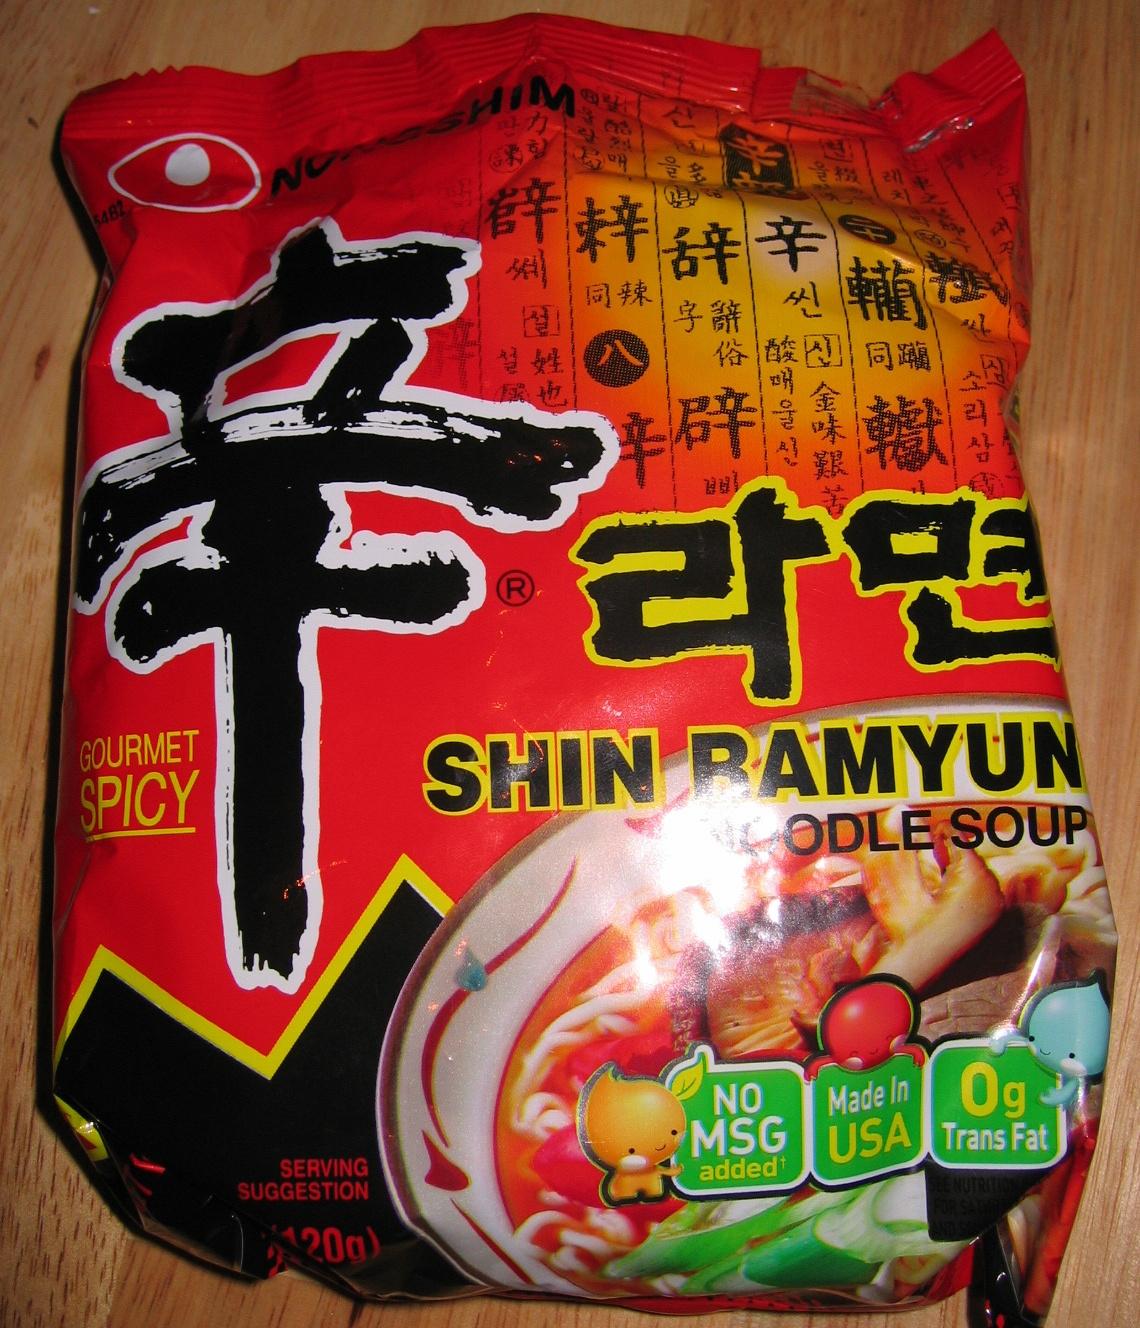 Shin Ramyun - Product